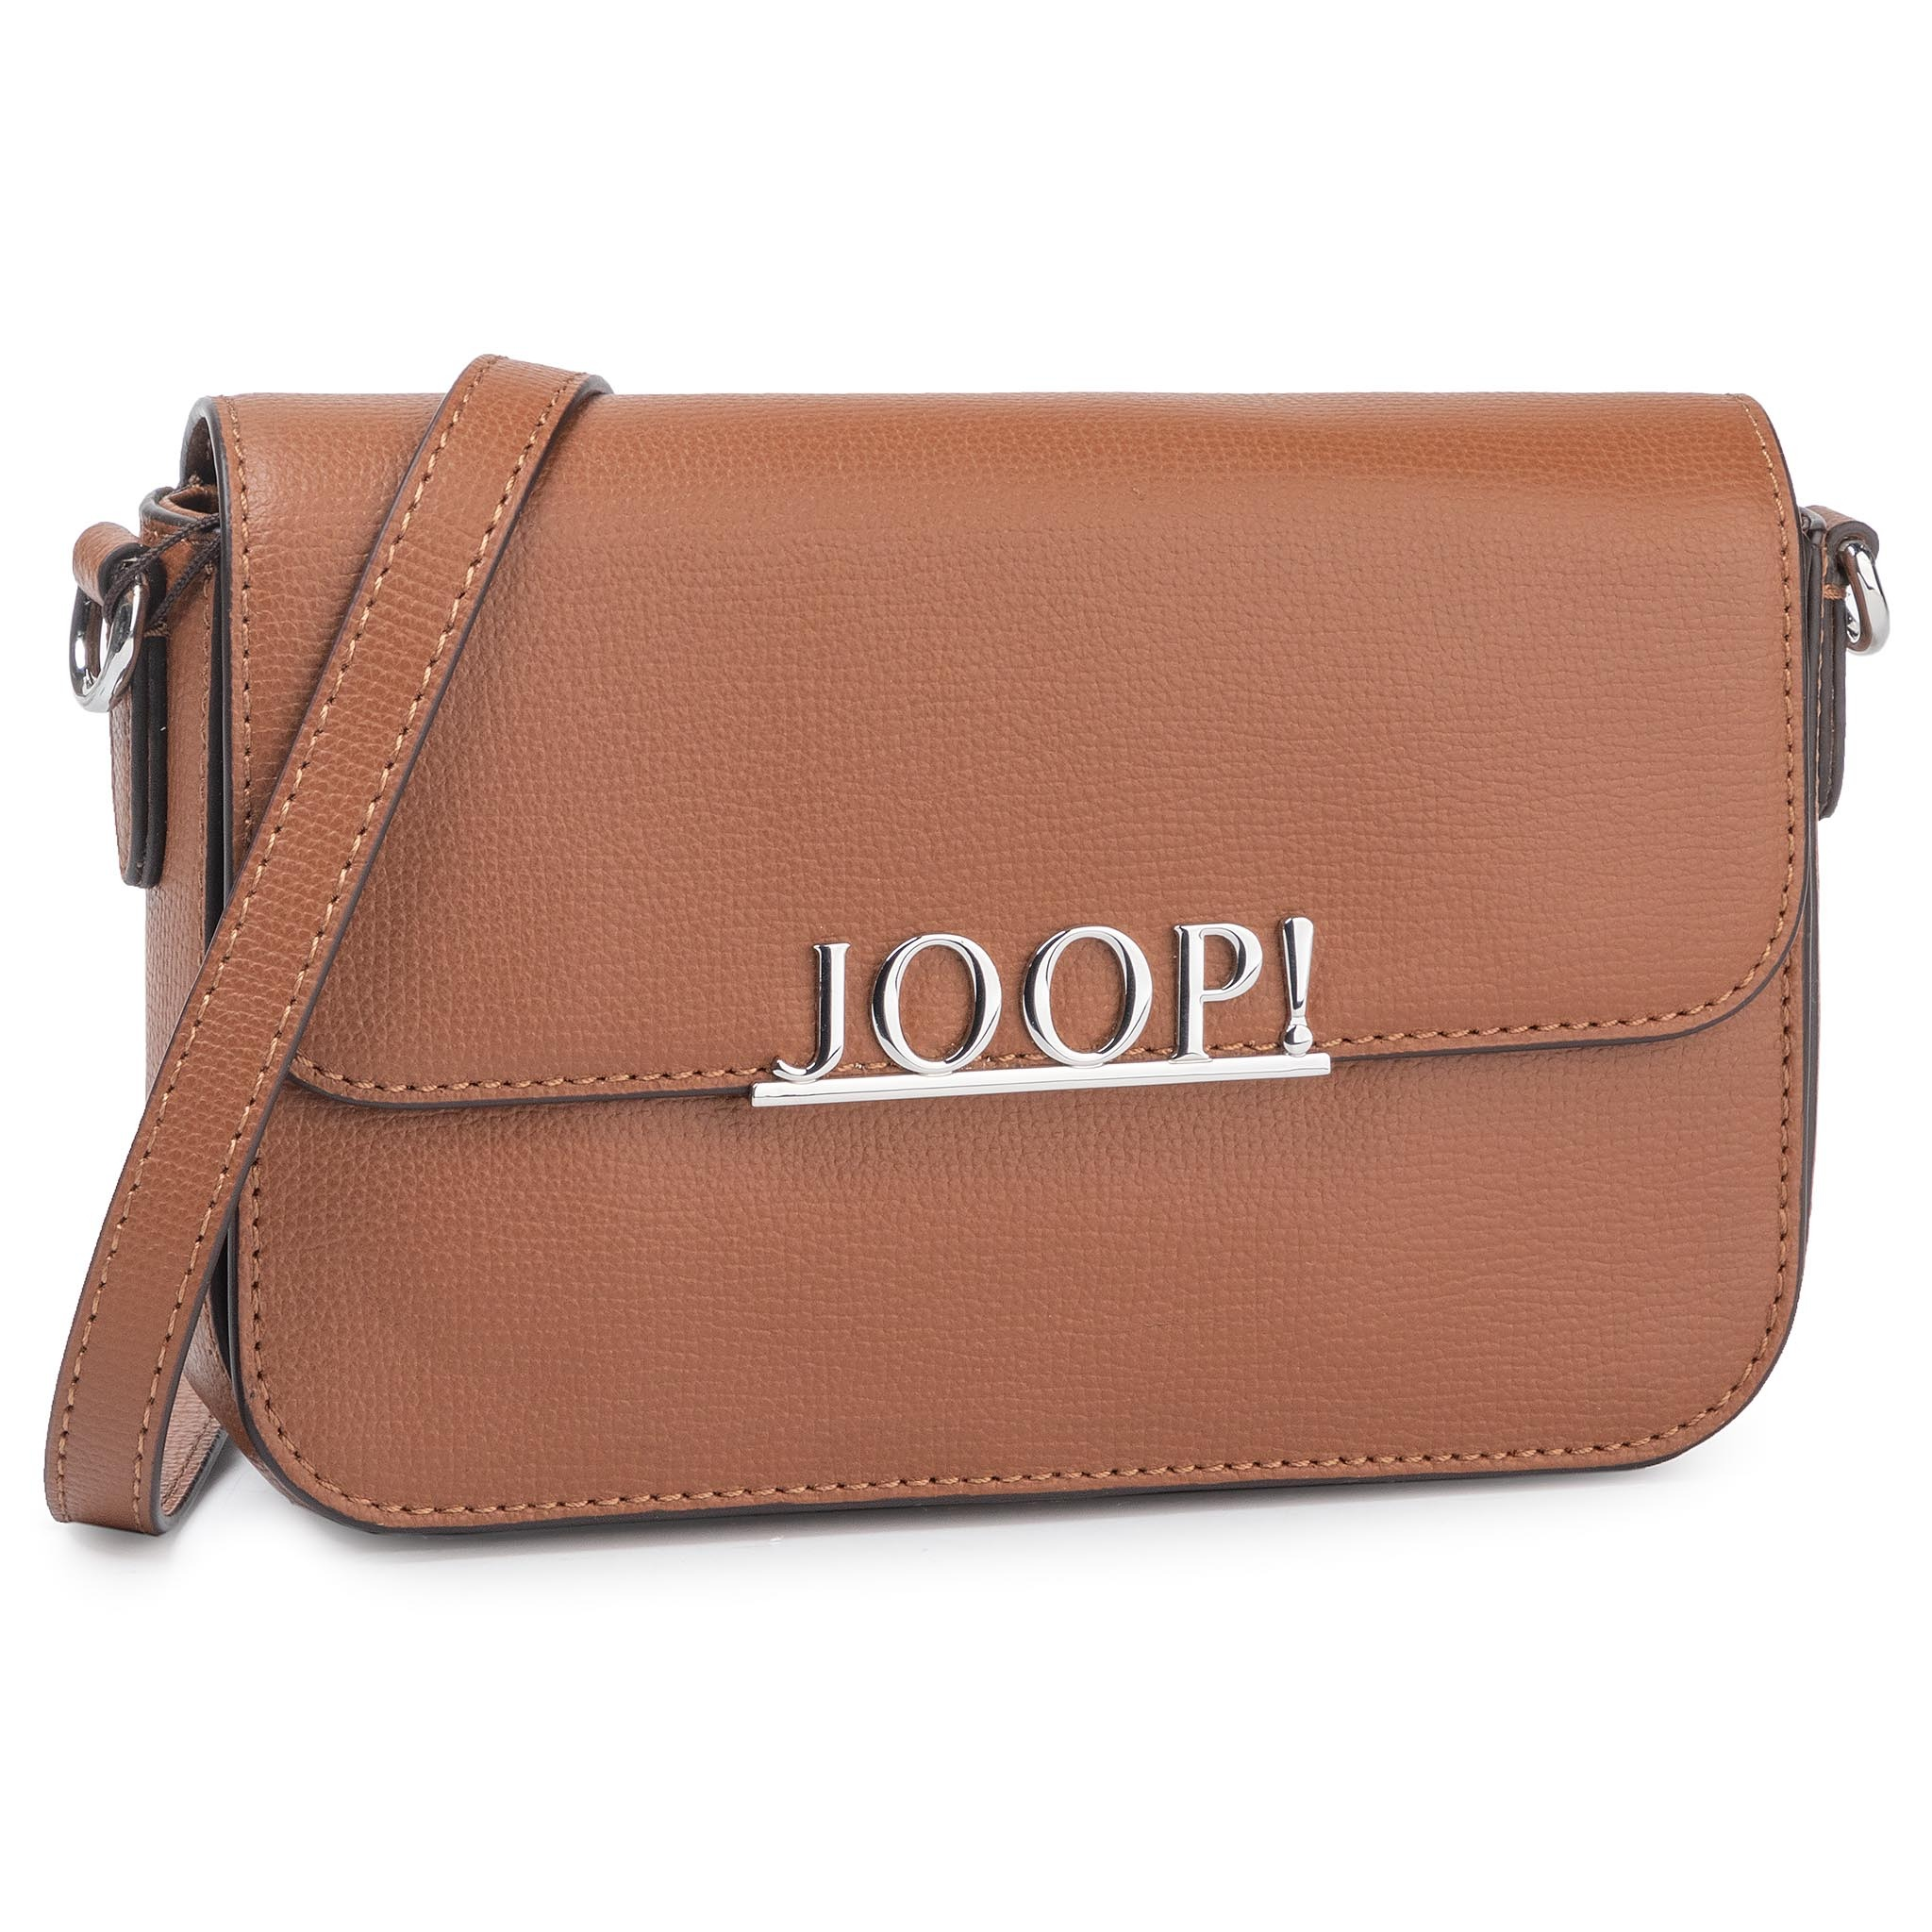 Geantă JOOP! - Granella 4140004512 Camel 751